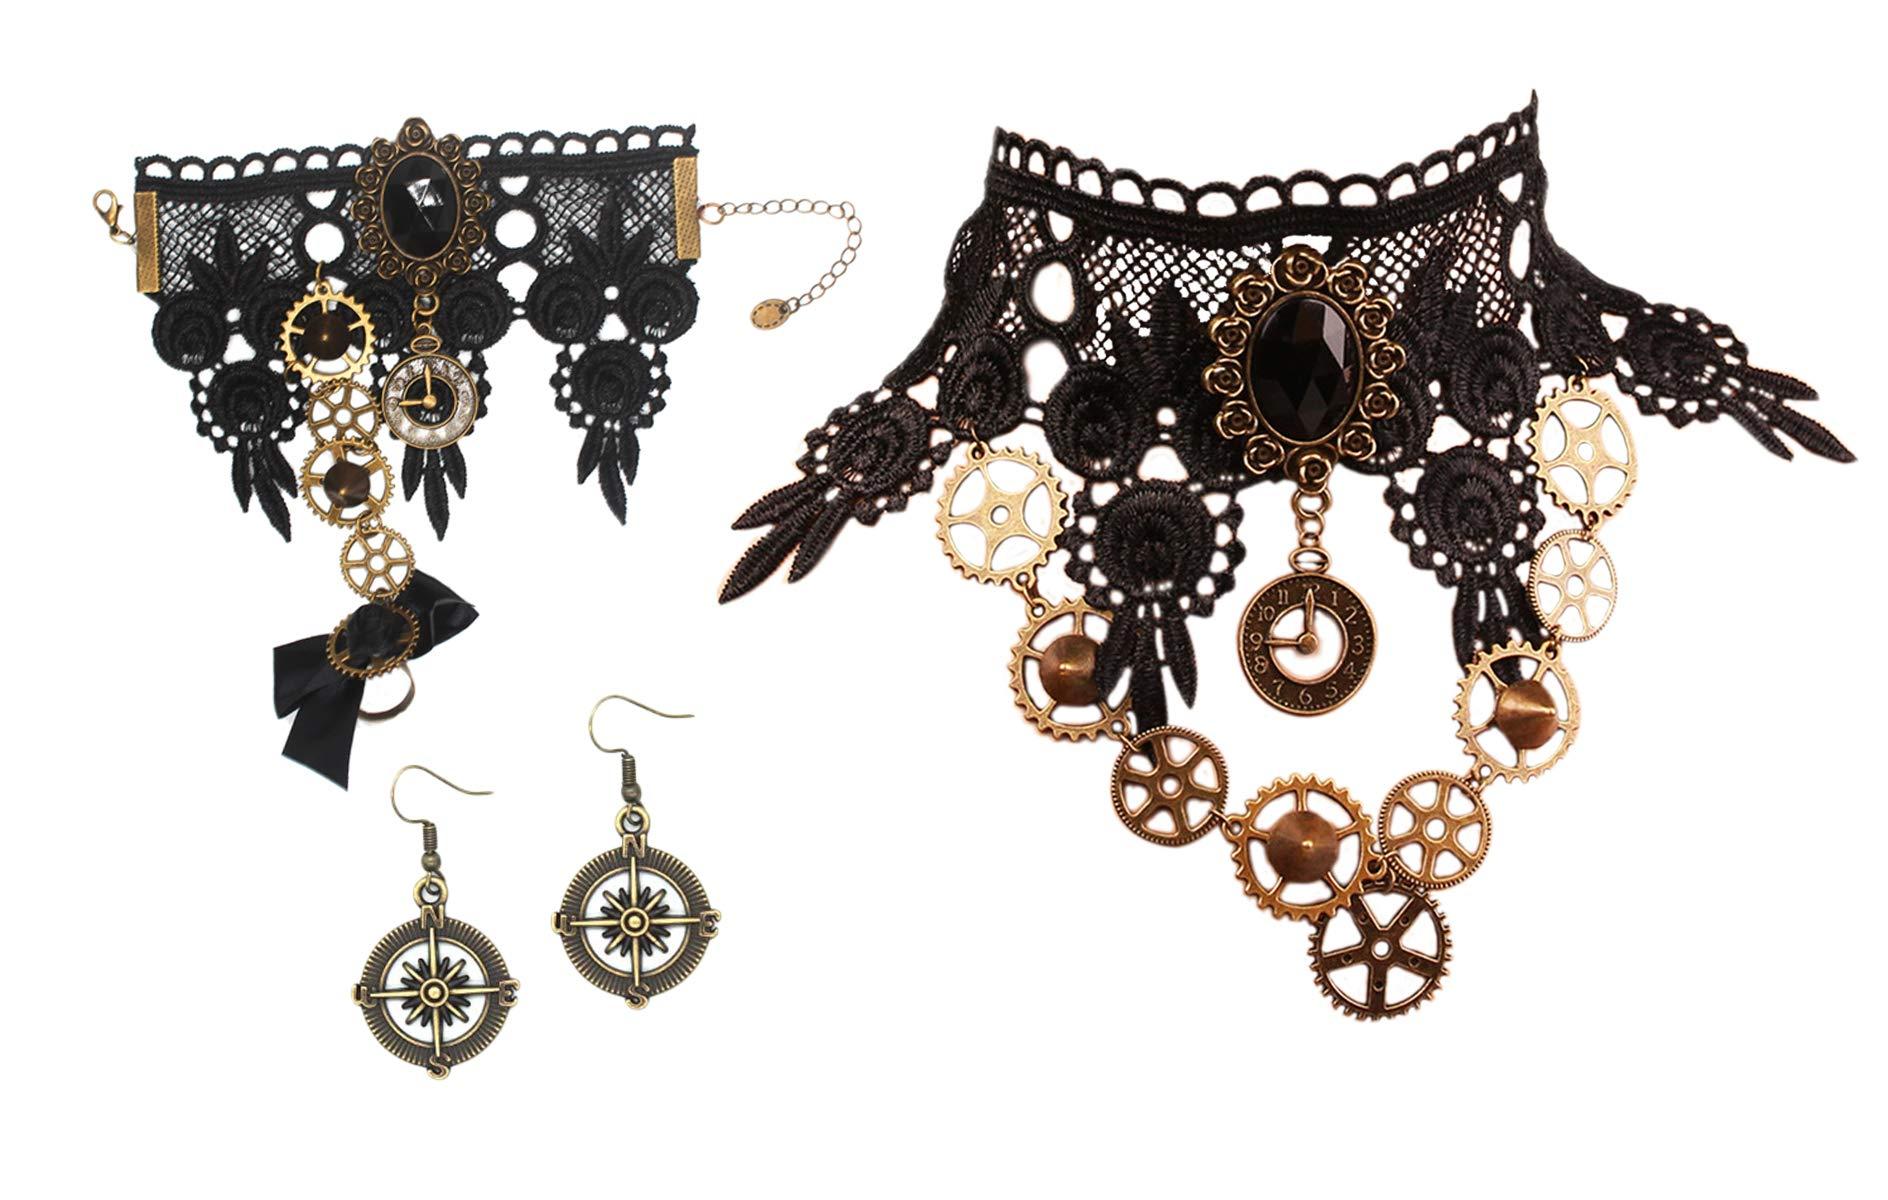 Black Lace Gothic Lolita Pendant Choker Necklace Earrings Set